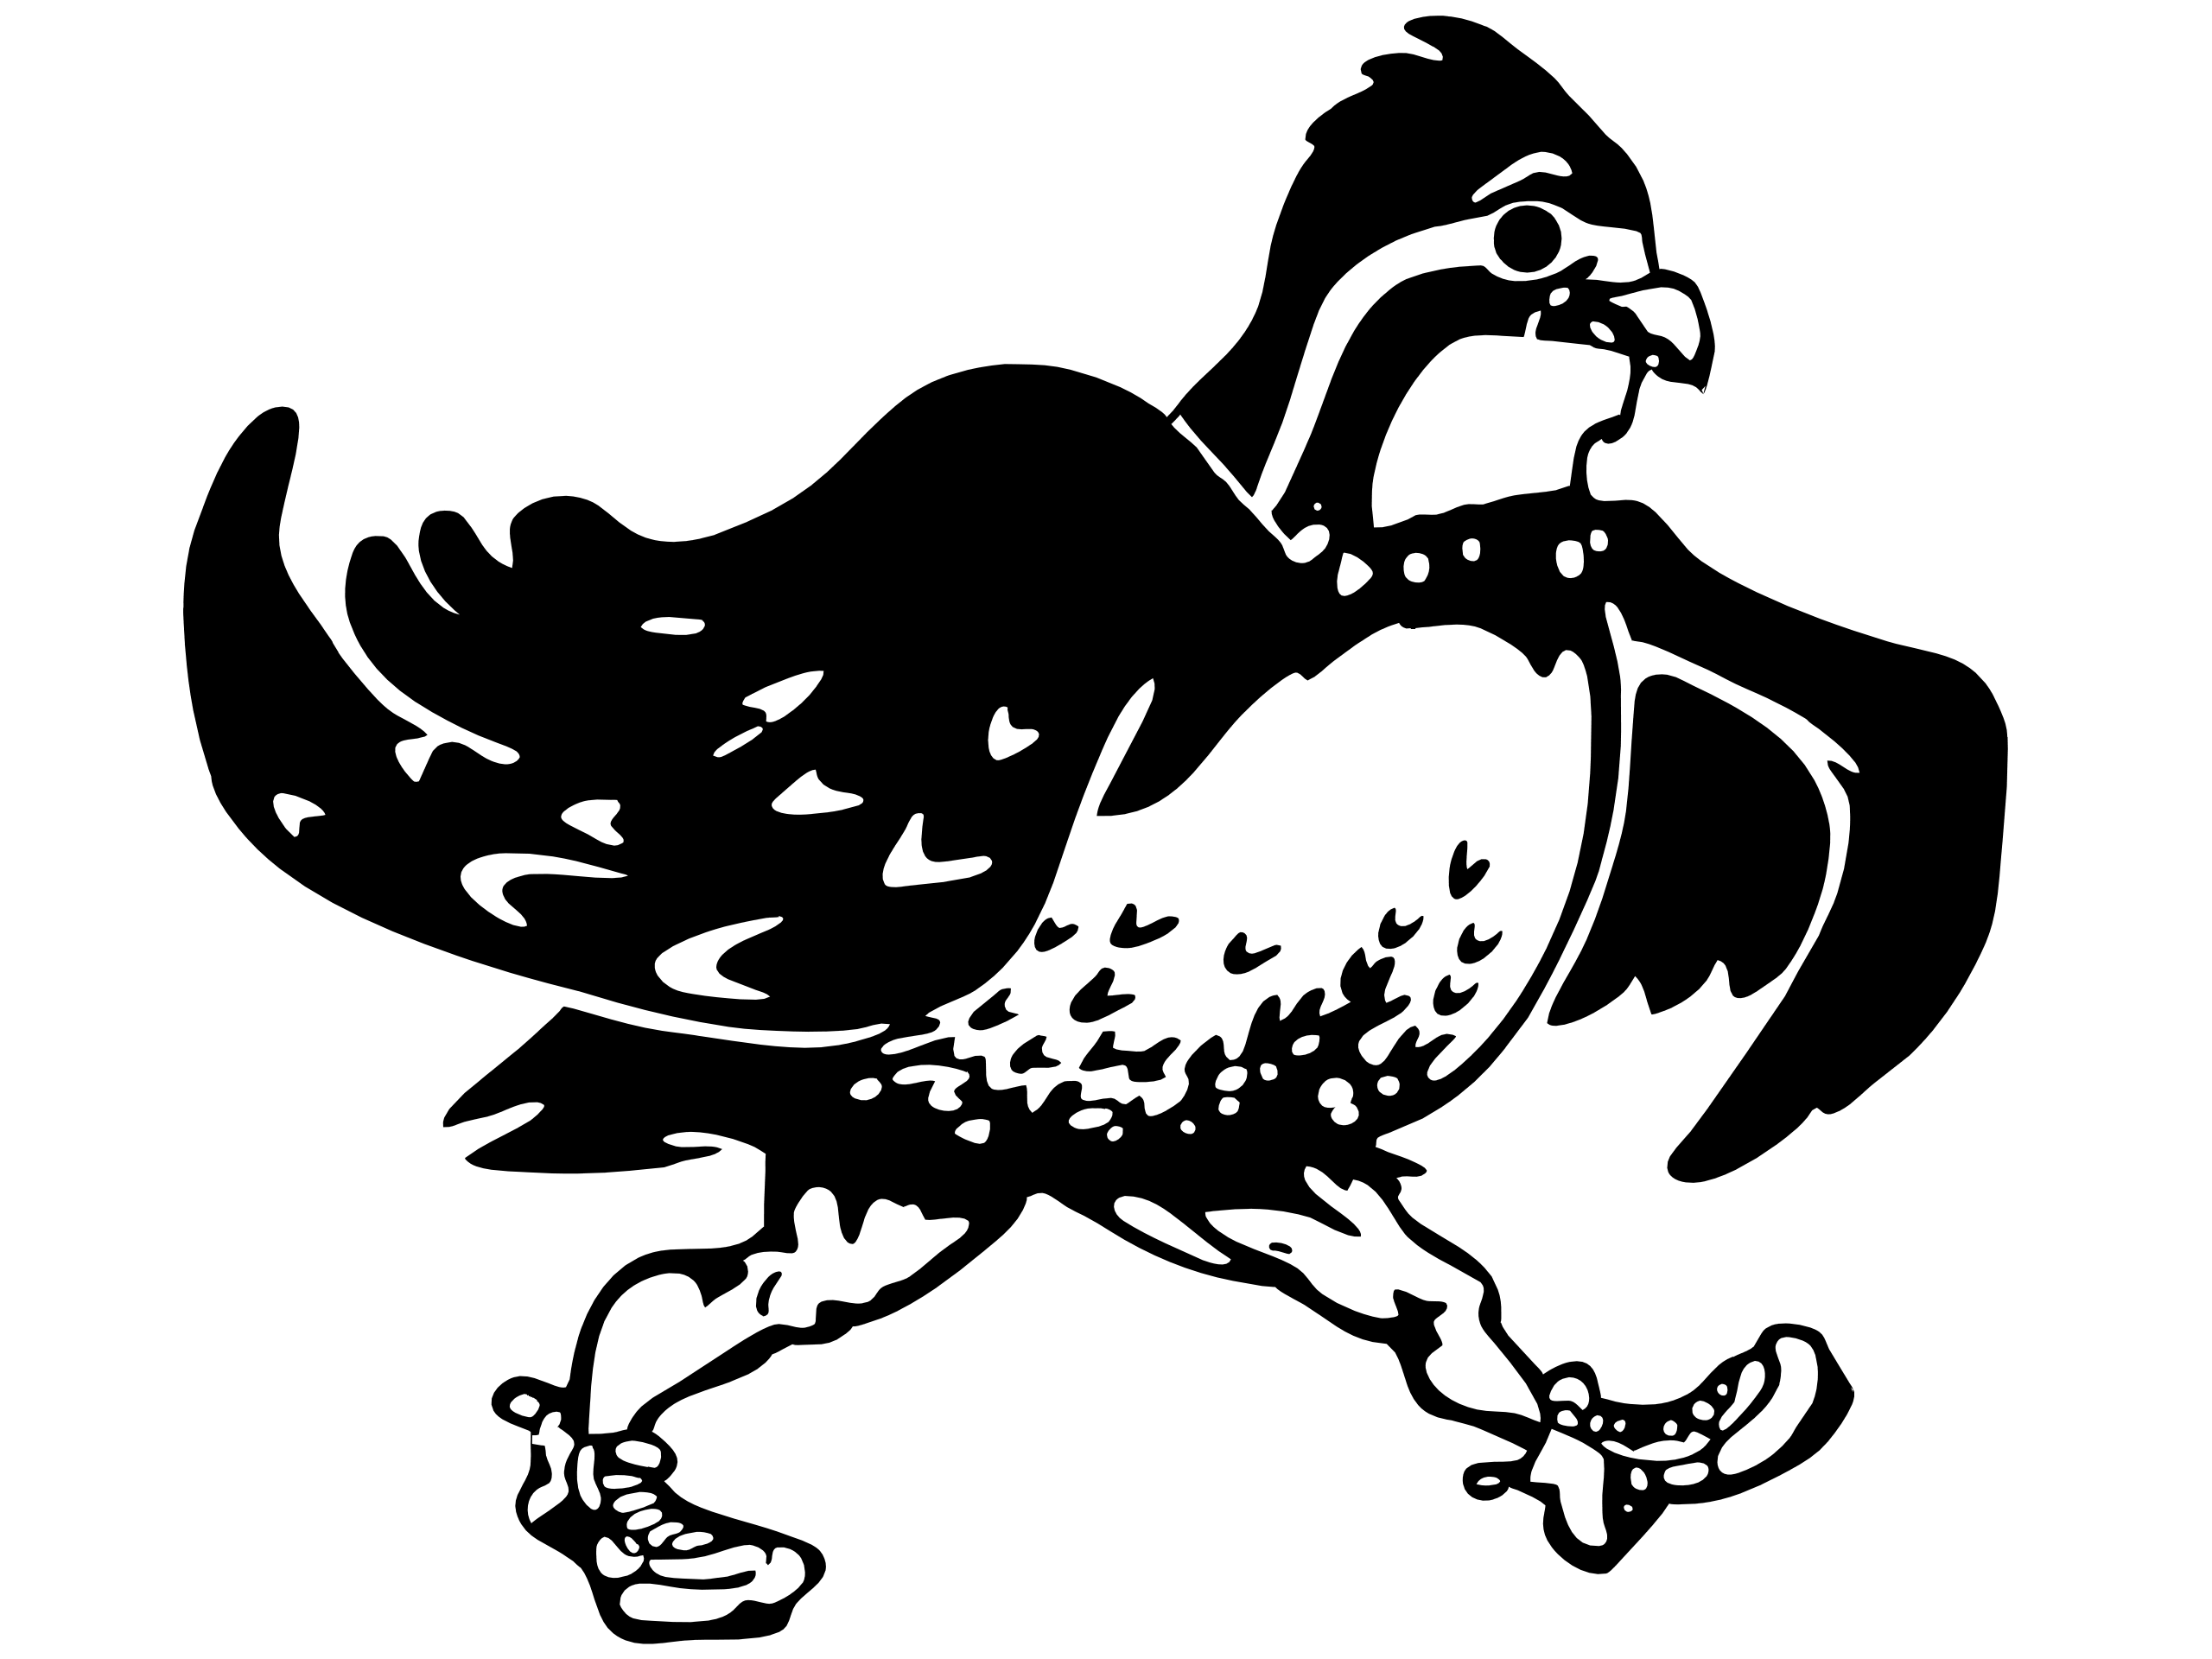 The jacob hood website. Quail clipart quail bird